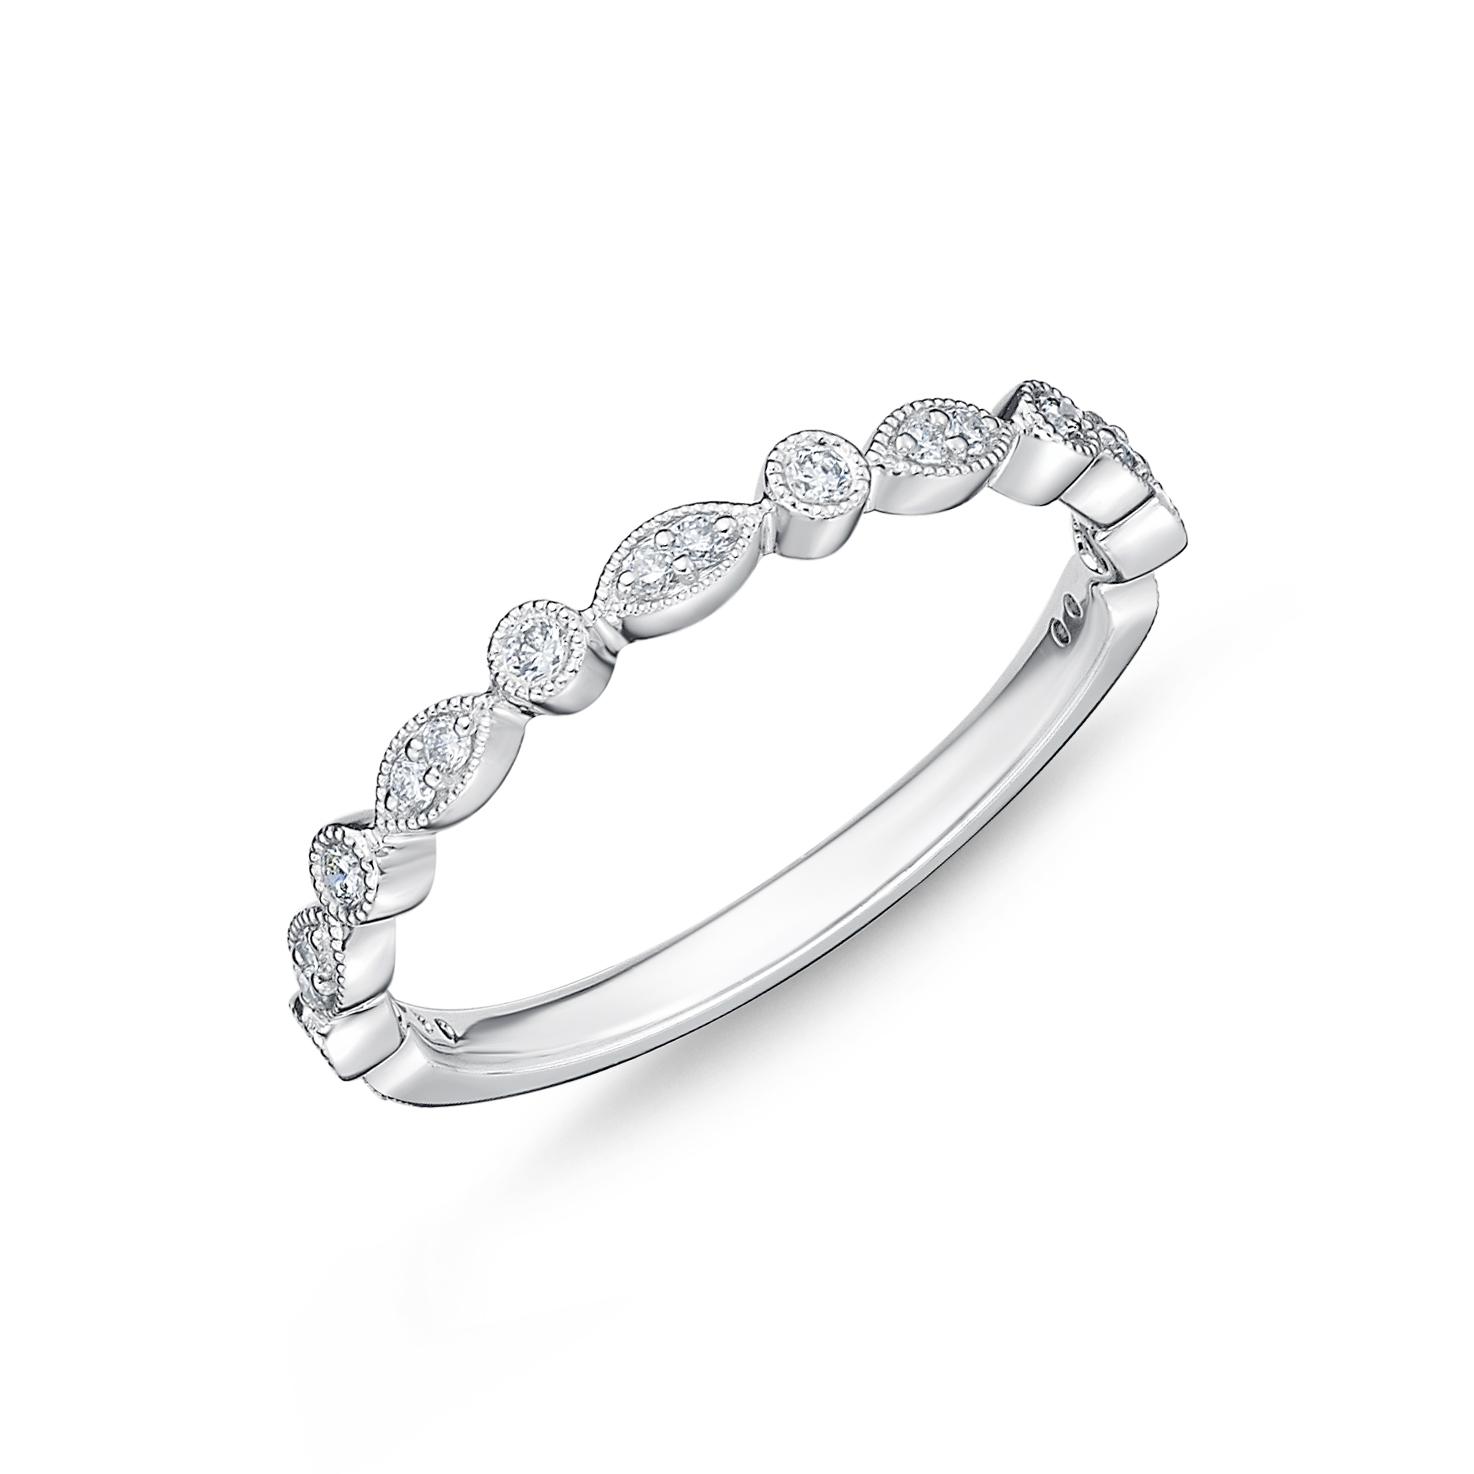 18ct White Gold 0.15 Carat Diamond Vintage Round & Illusion Marquise Stack Ring